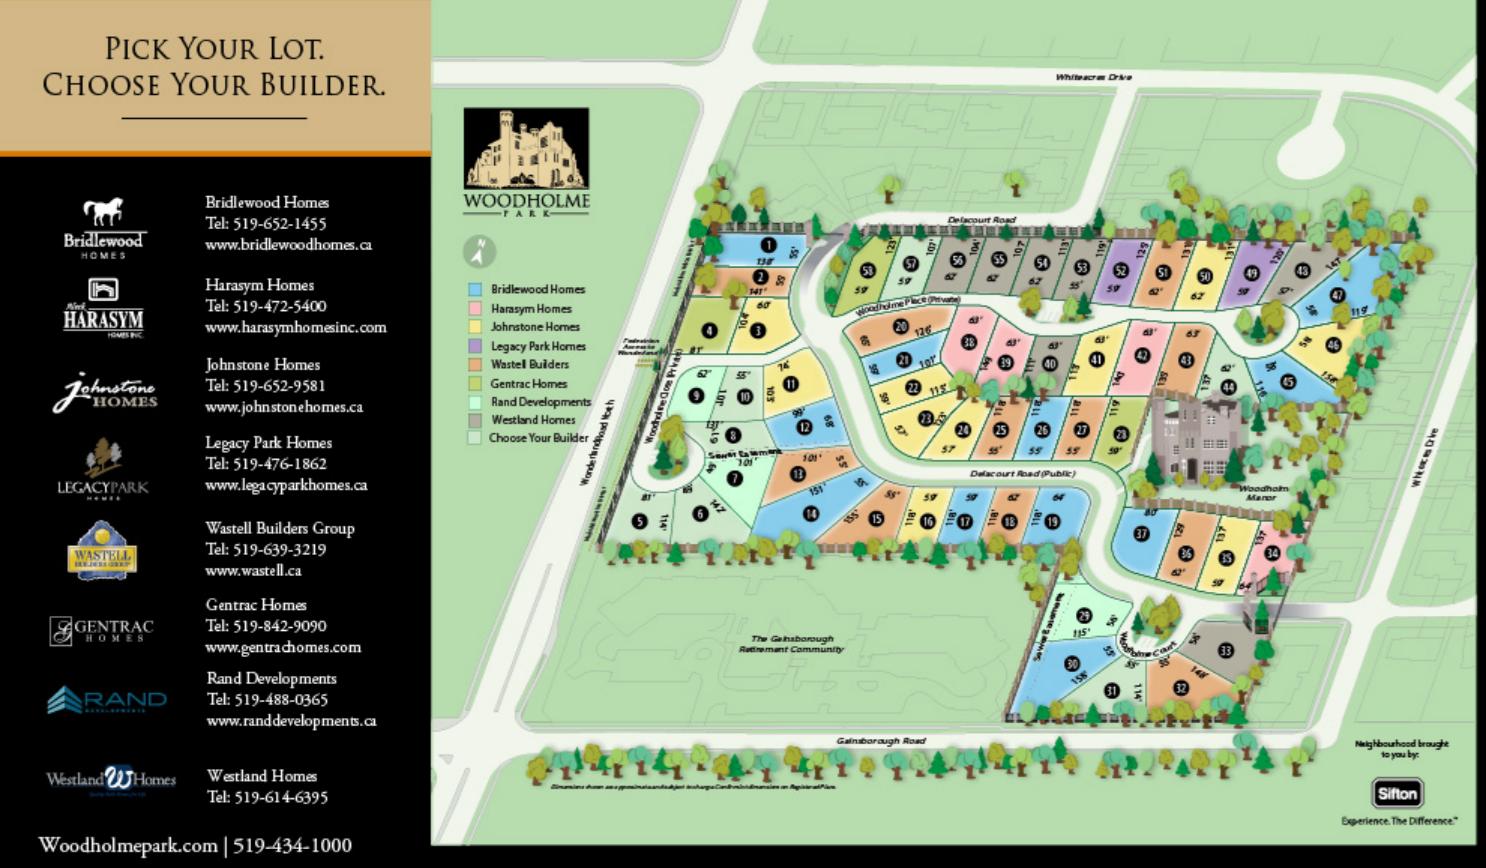 Site plan for Woodholme Park in London, Ontario